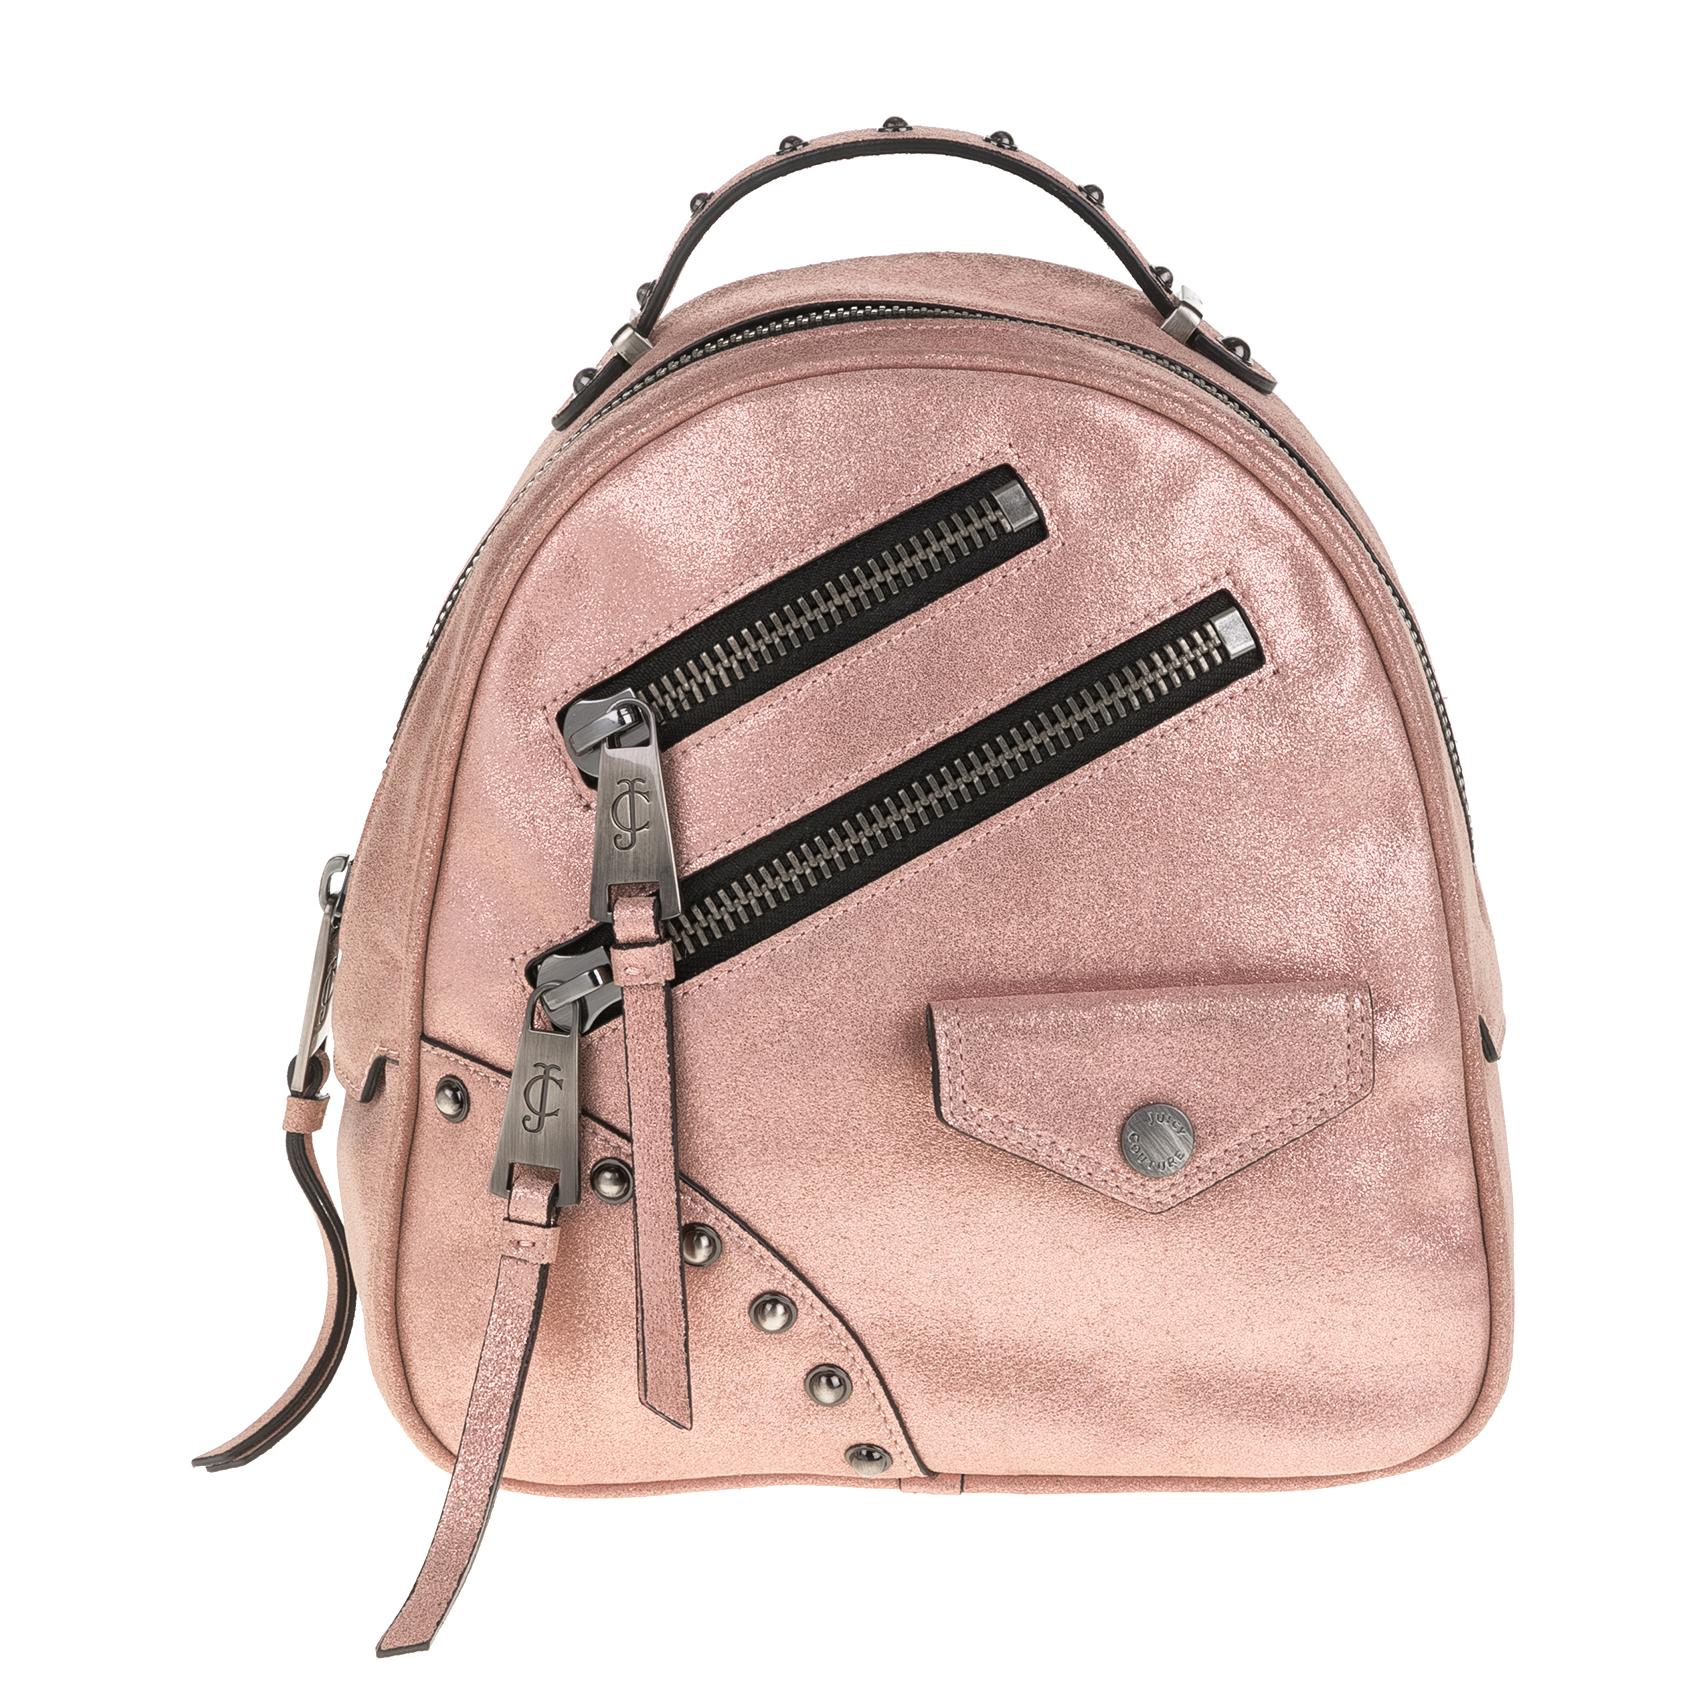 JUICY COUTURE – Γυναικείο σακίδιο πλάτης JUICY COUTURE ροζ 1532917.0-00P4